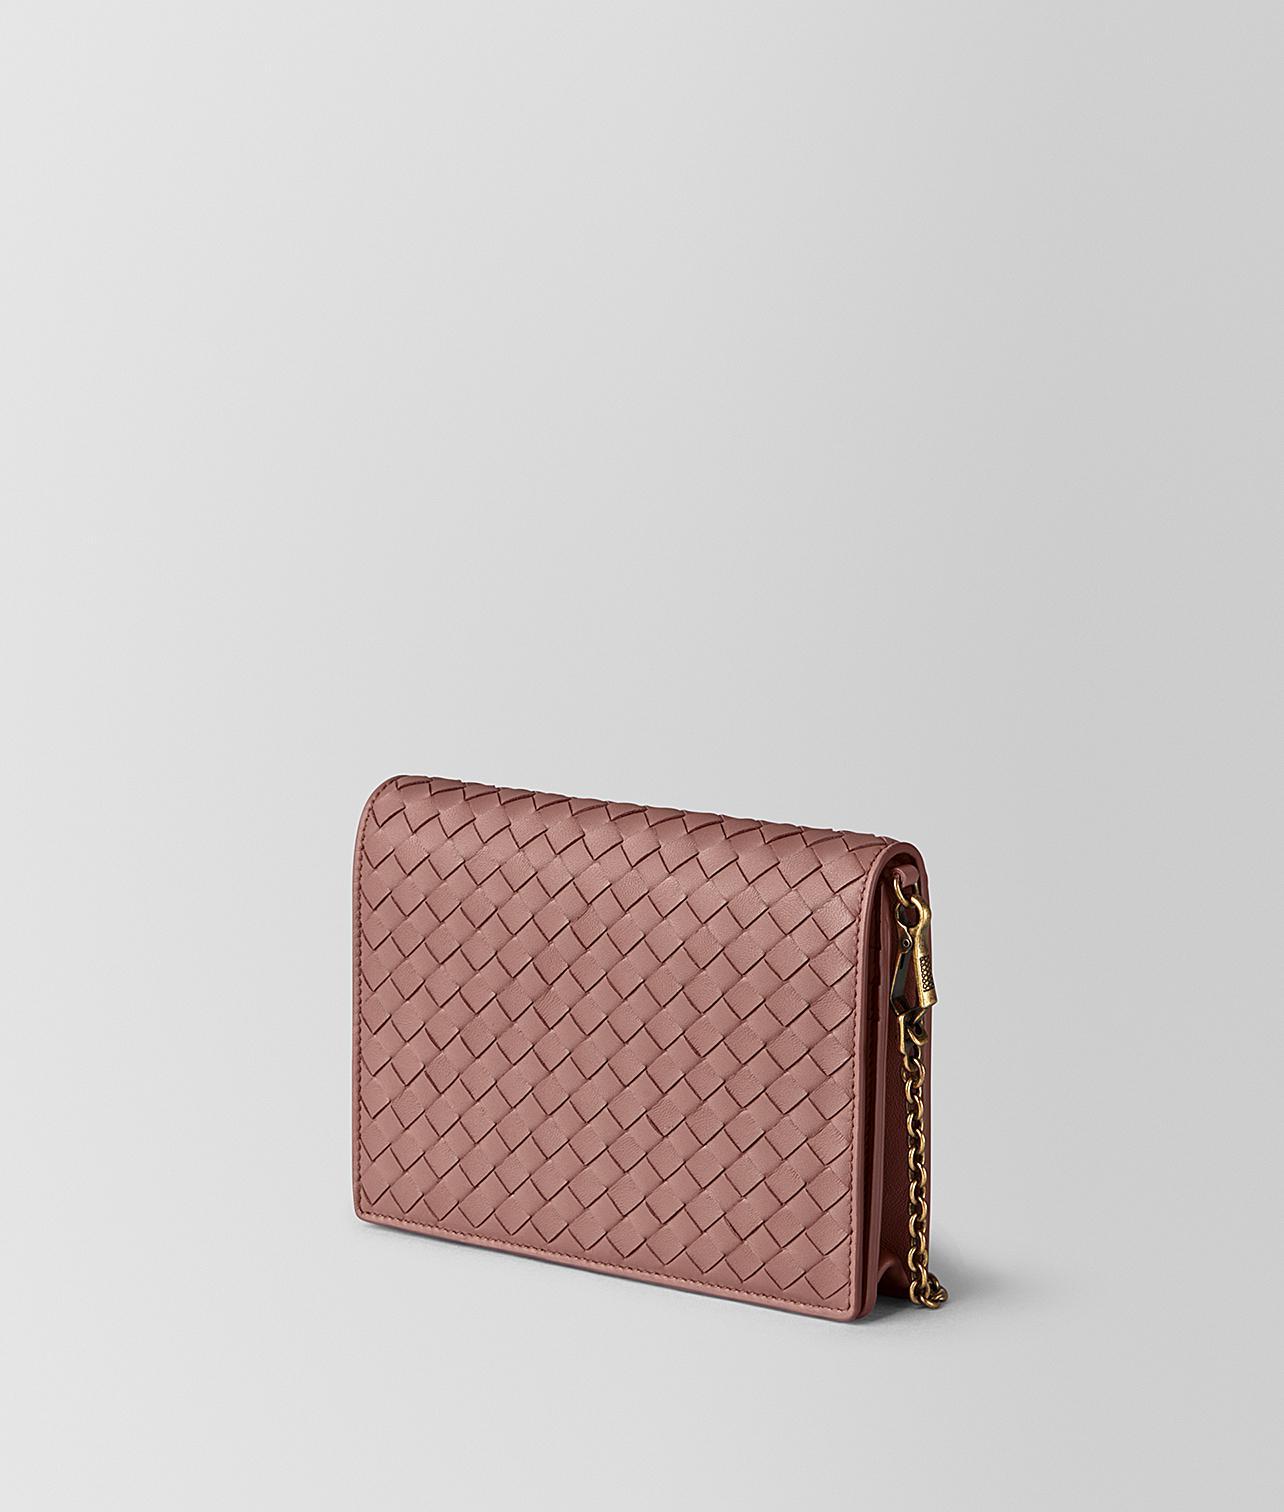 0d200411d854 Bottega Veneta Dark Barolo Intrecciato Nappa Chain Wallet in Pink - Lyst